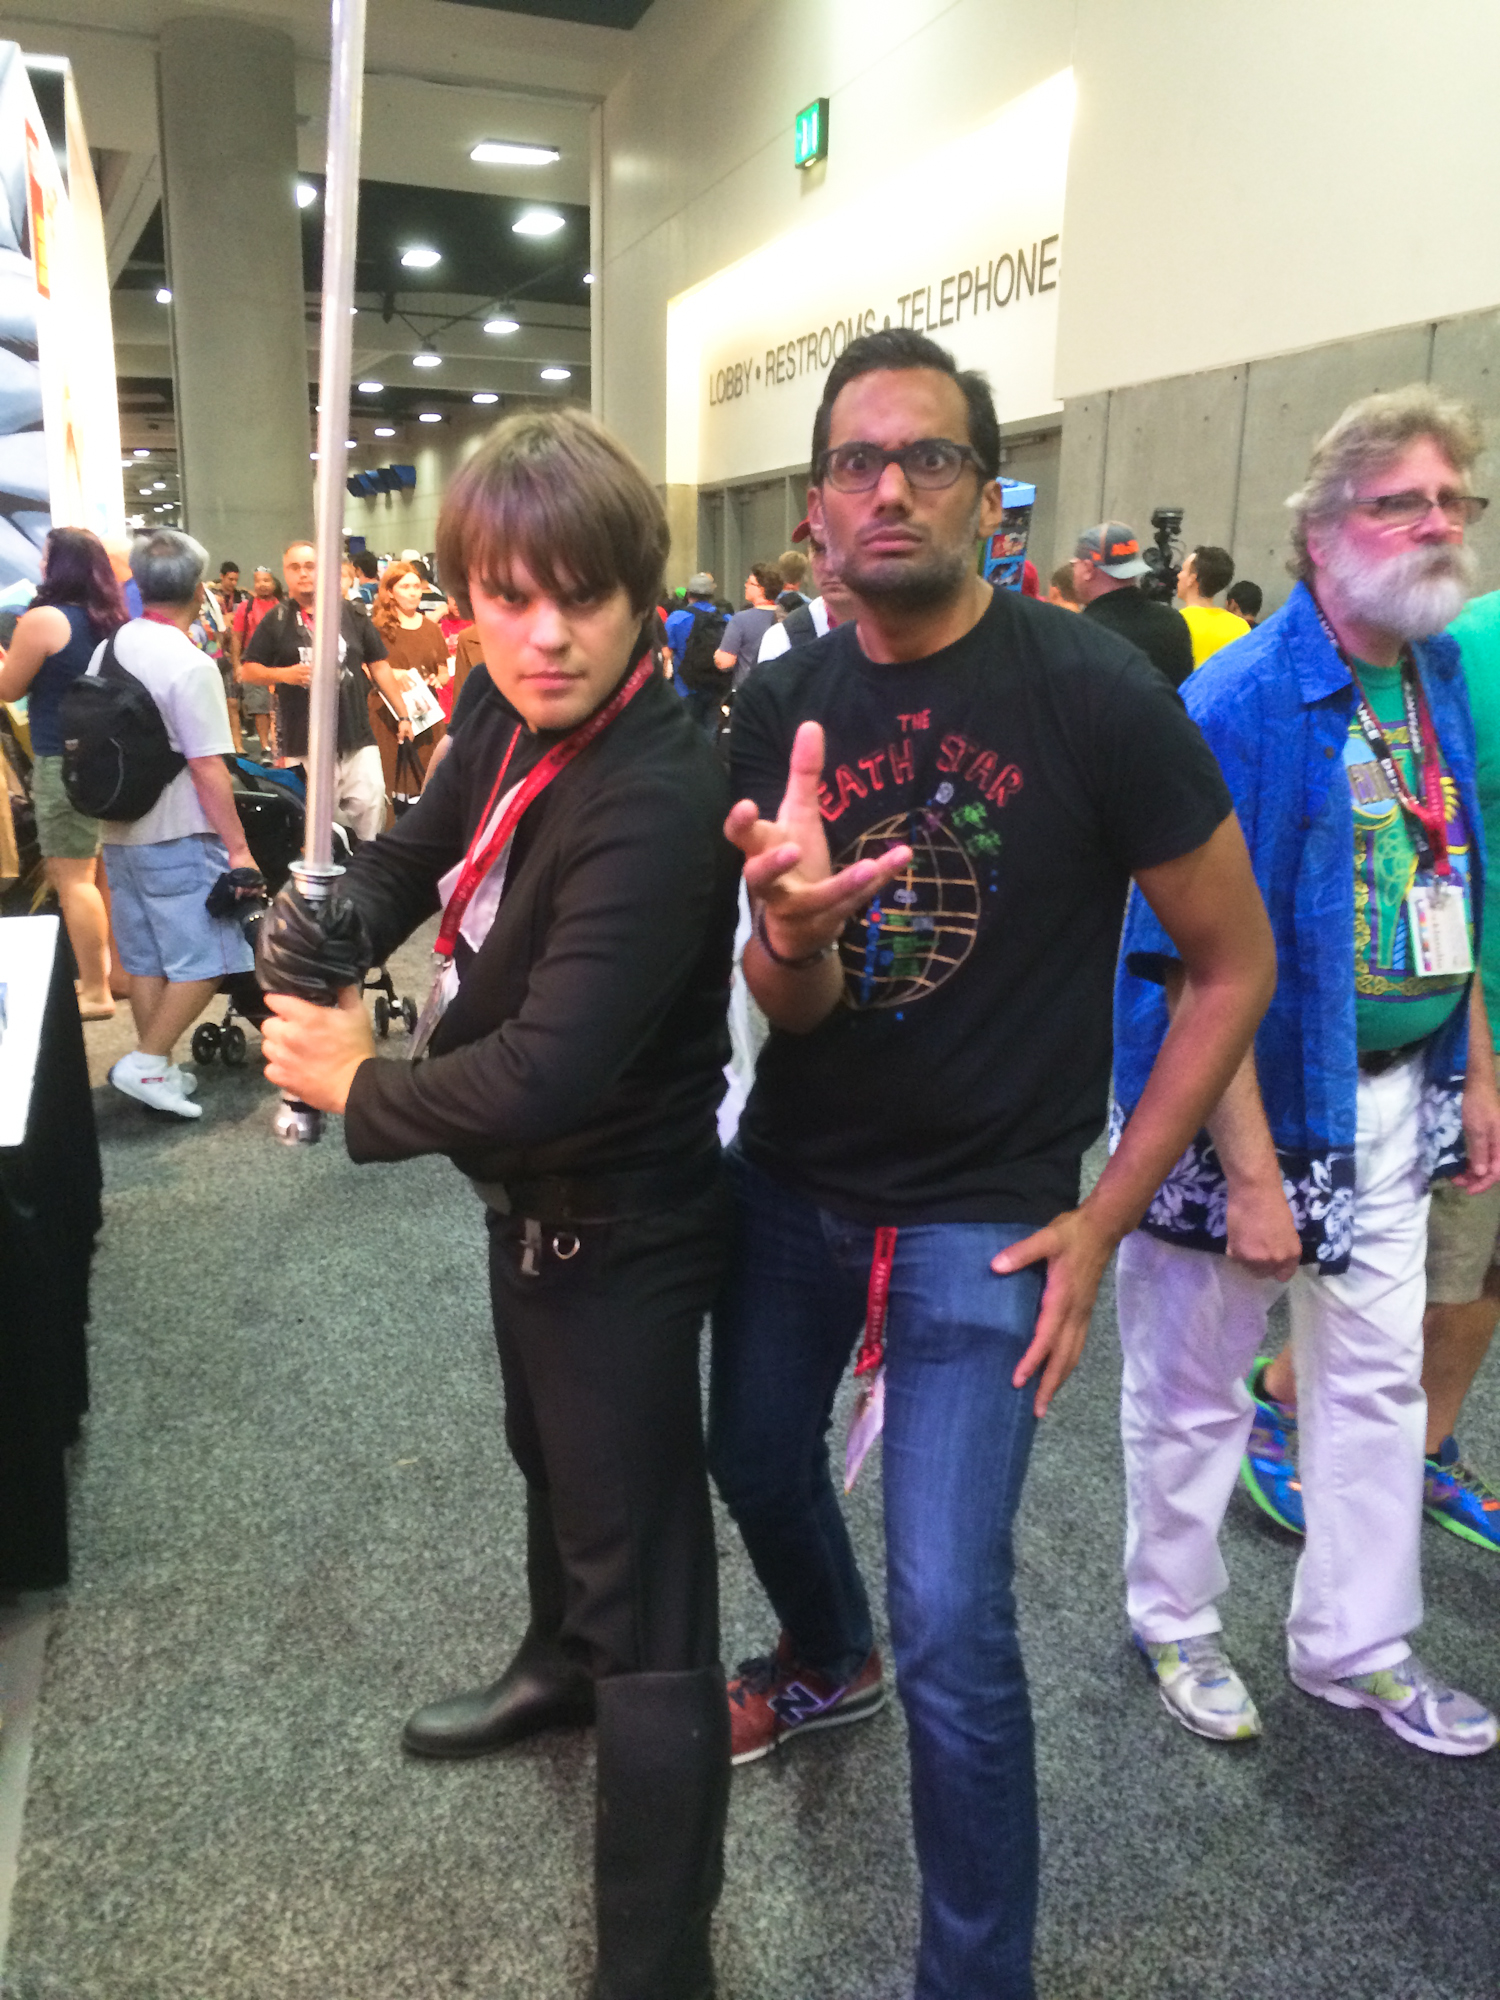 luke-skywalker-return-of-the-jedi-cosplay-san-diego-comic-con.jpg